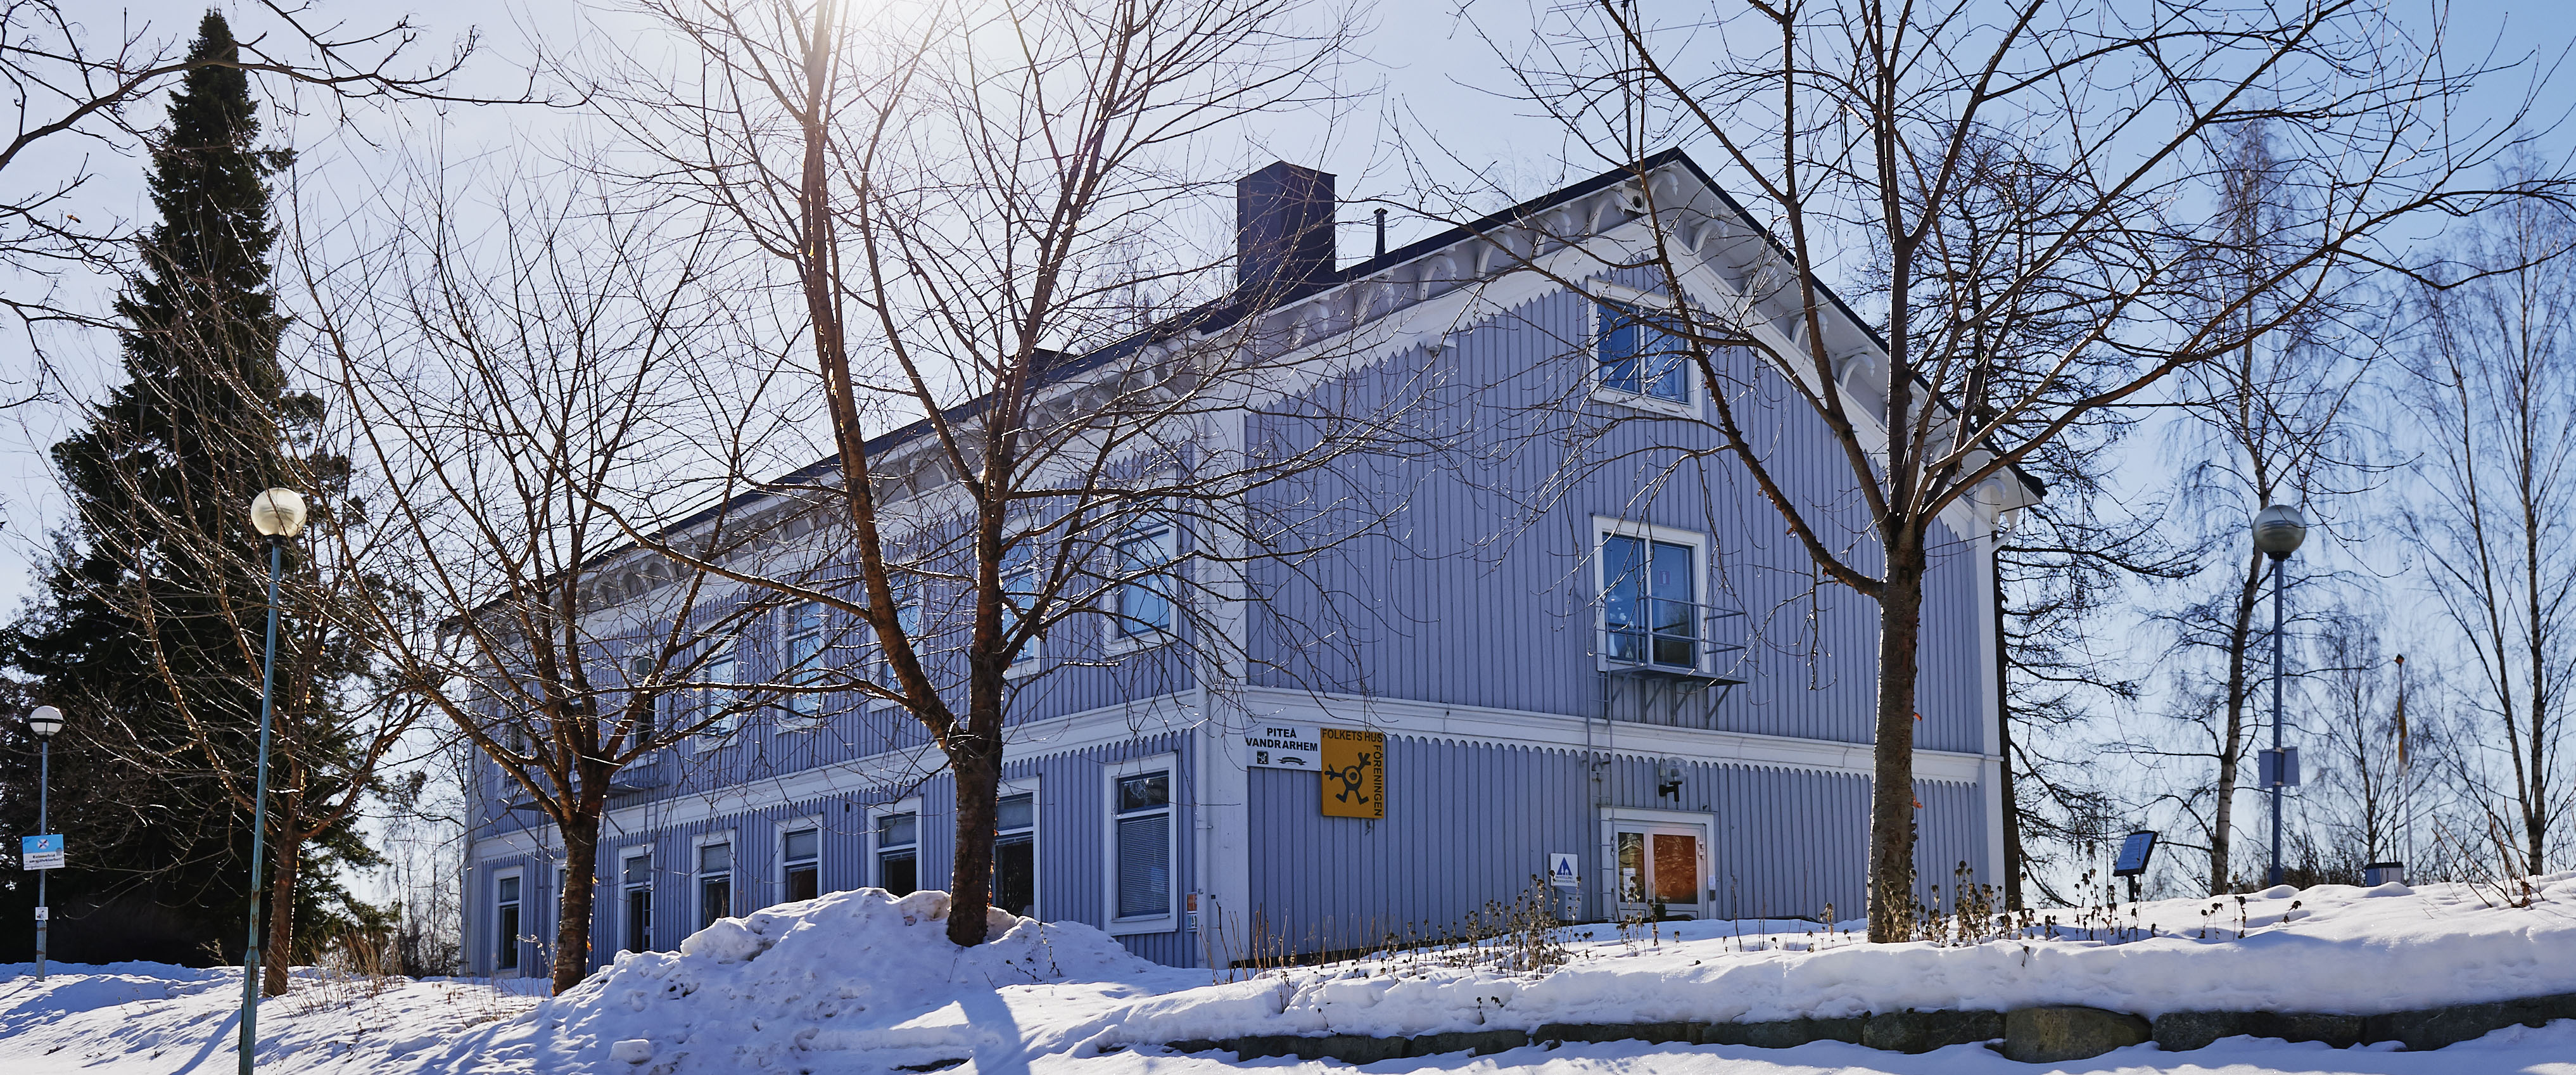 Piteå Vandrarhem huset vintertid